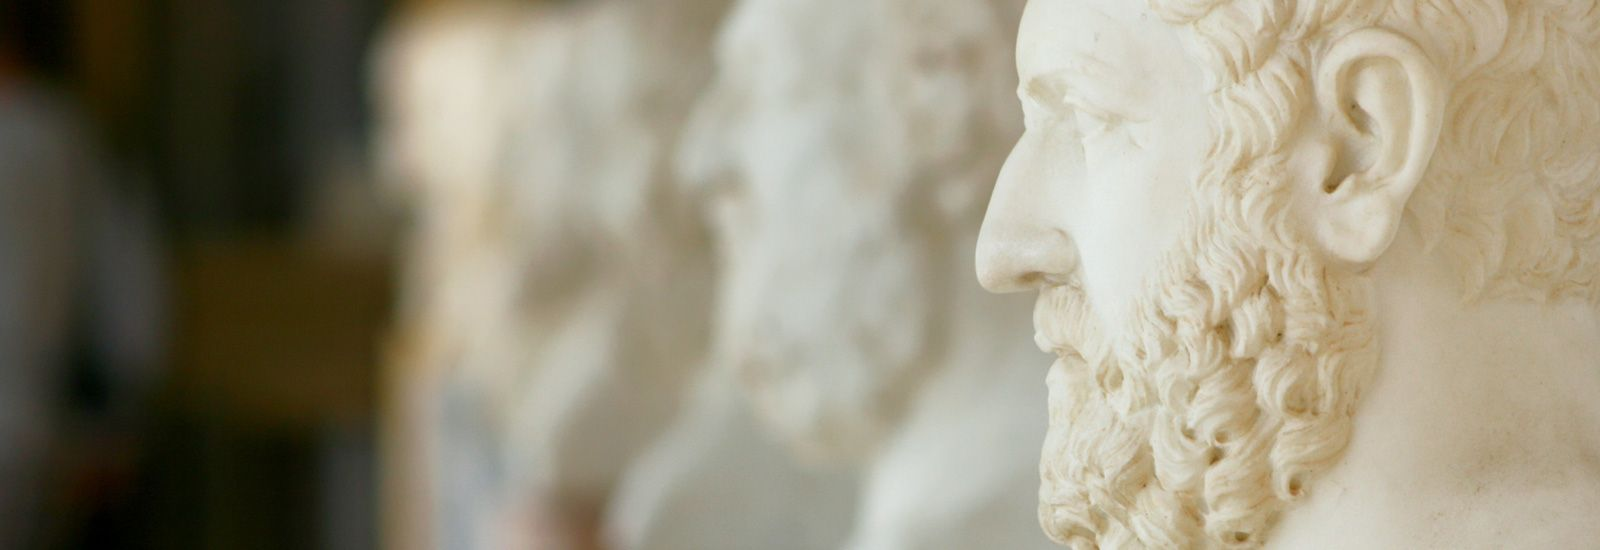 Philosophers busts on the terrace of Achillion palace, Corfu, Greece.